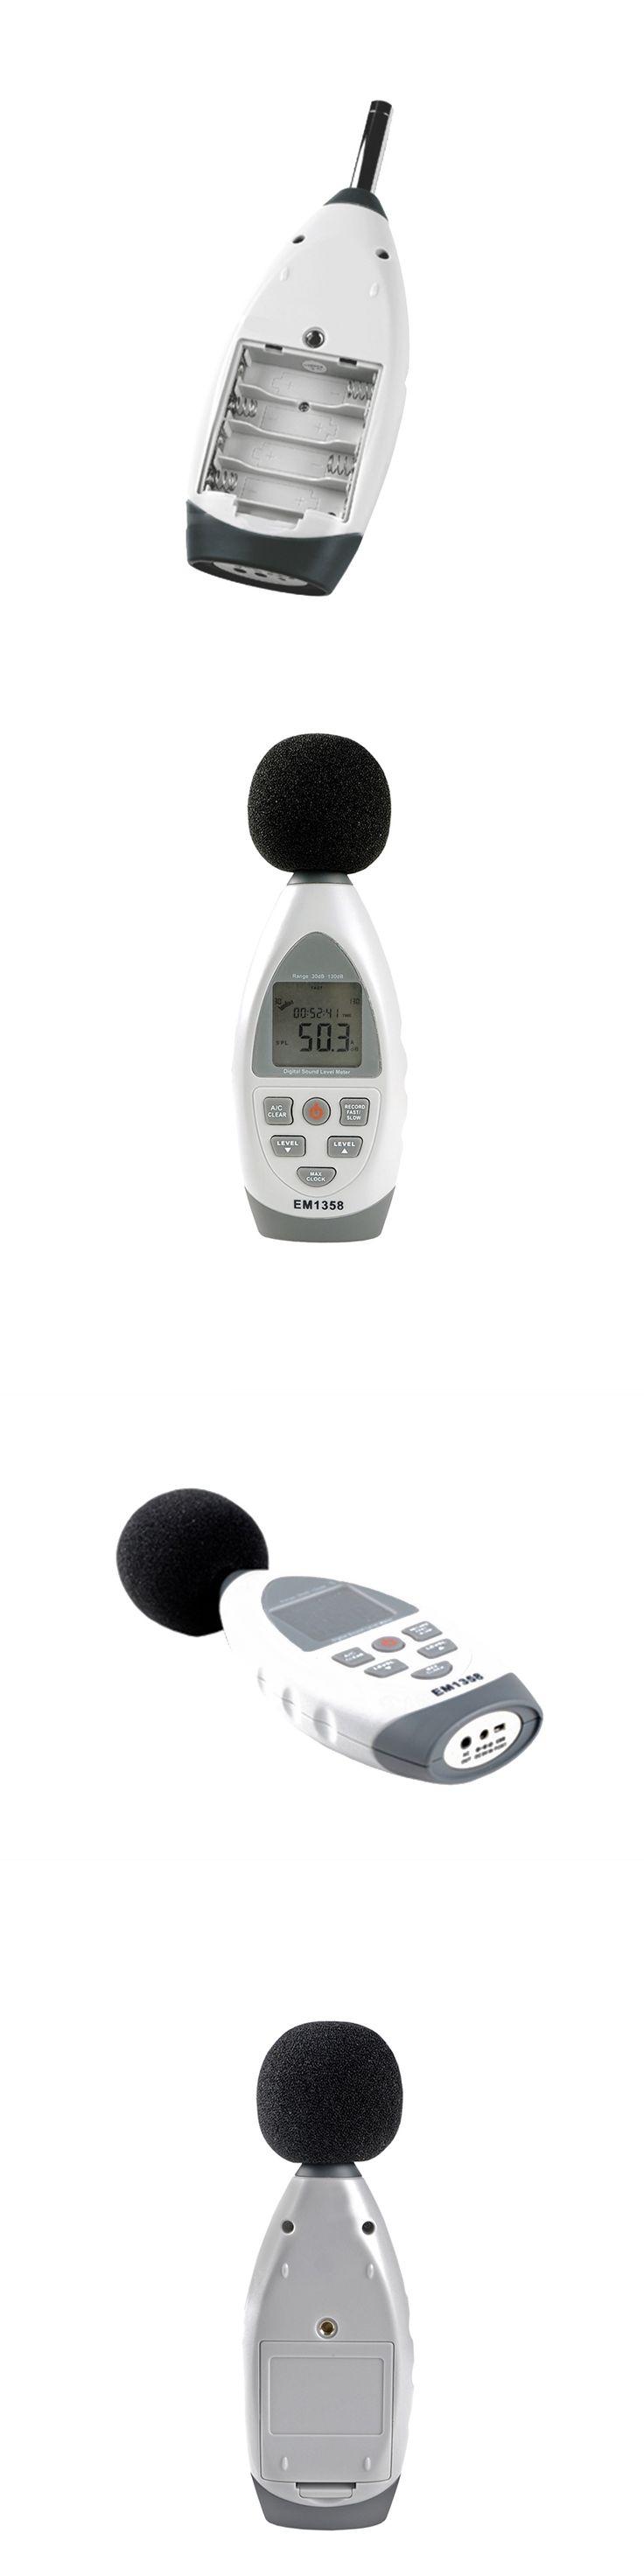 LCD Backlight Digital Professional USB Sound Level Meter Noise Tester Noise Measuring Instrument Decibel Tester 35-130dBA